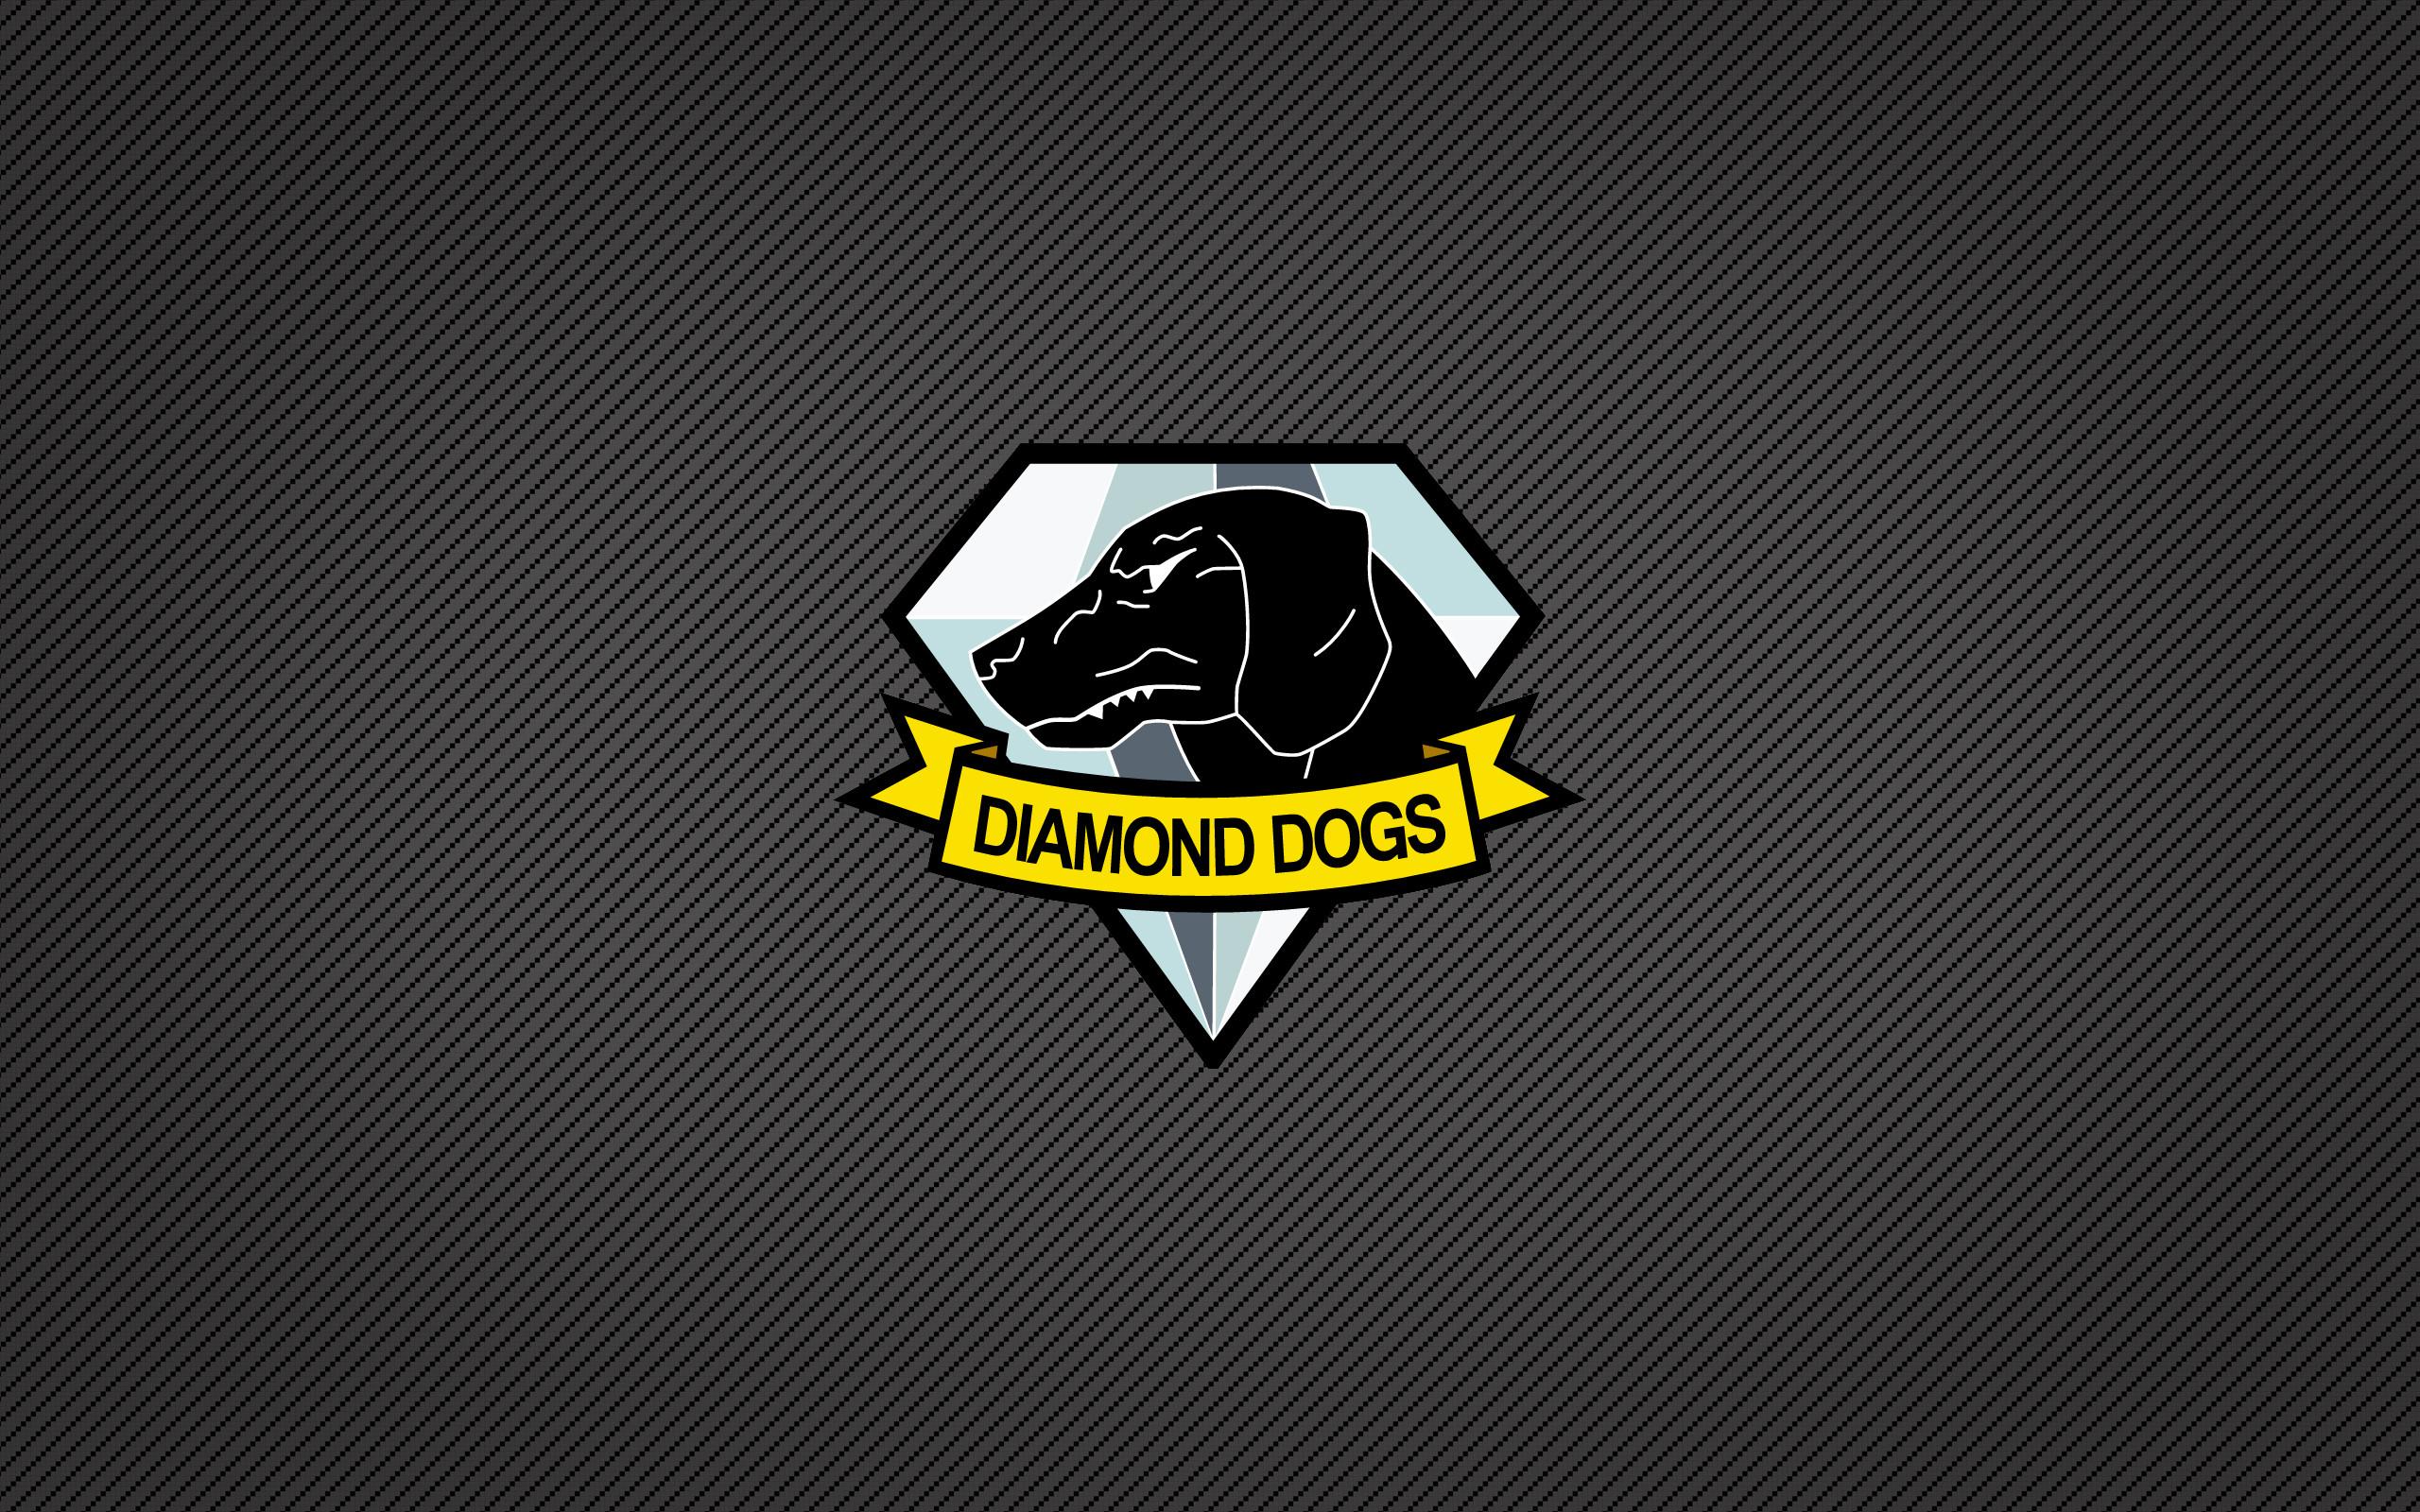 Diamond Dogs Video